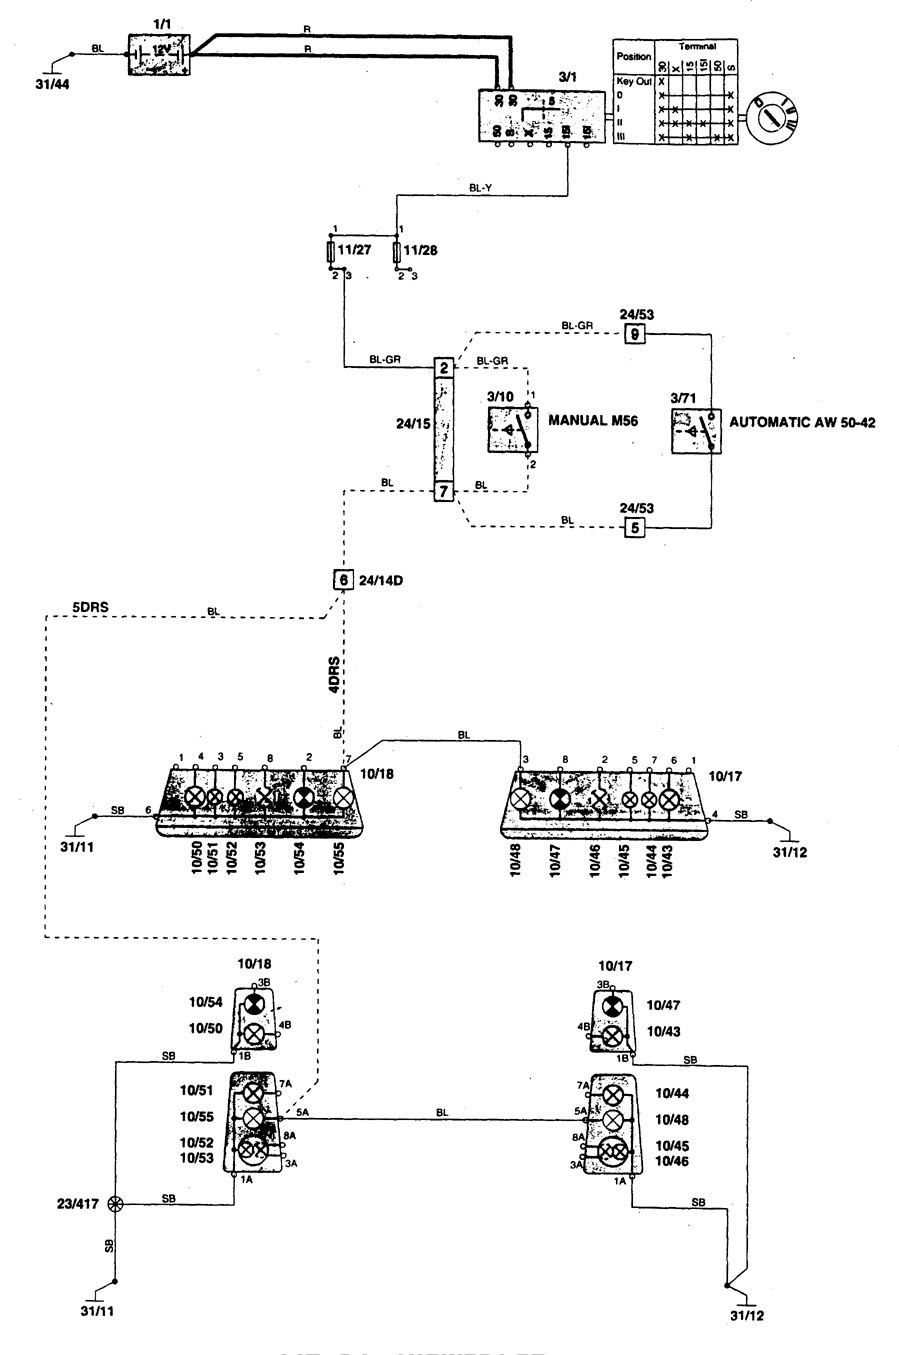 Volvo 850 1996 Wiring Diagrams Hvac Controls Carknowledge Diagram